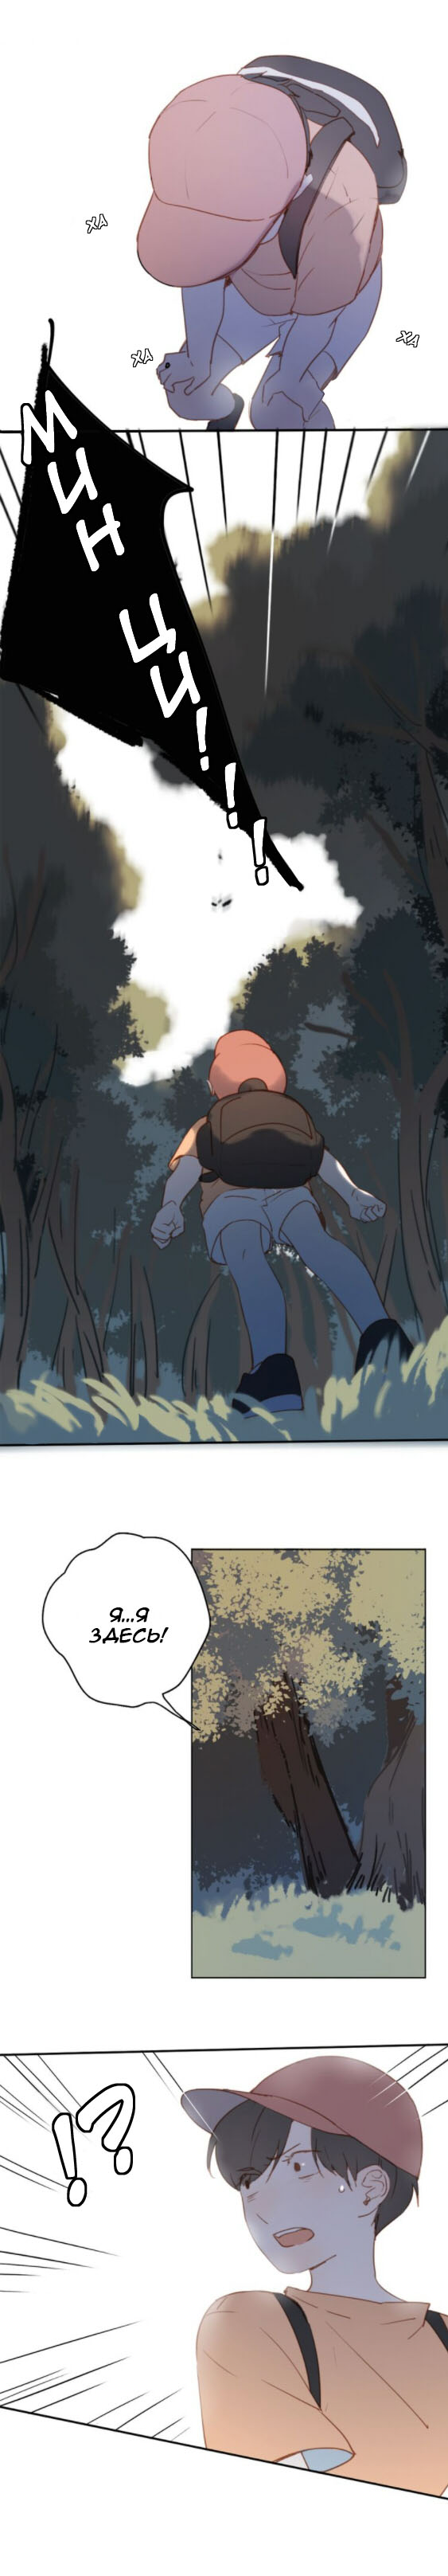 https://r1.ninemanga.com/comics/pic2/52/33012/332158/1503324402128.jpg Page 4